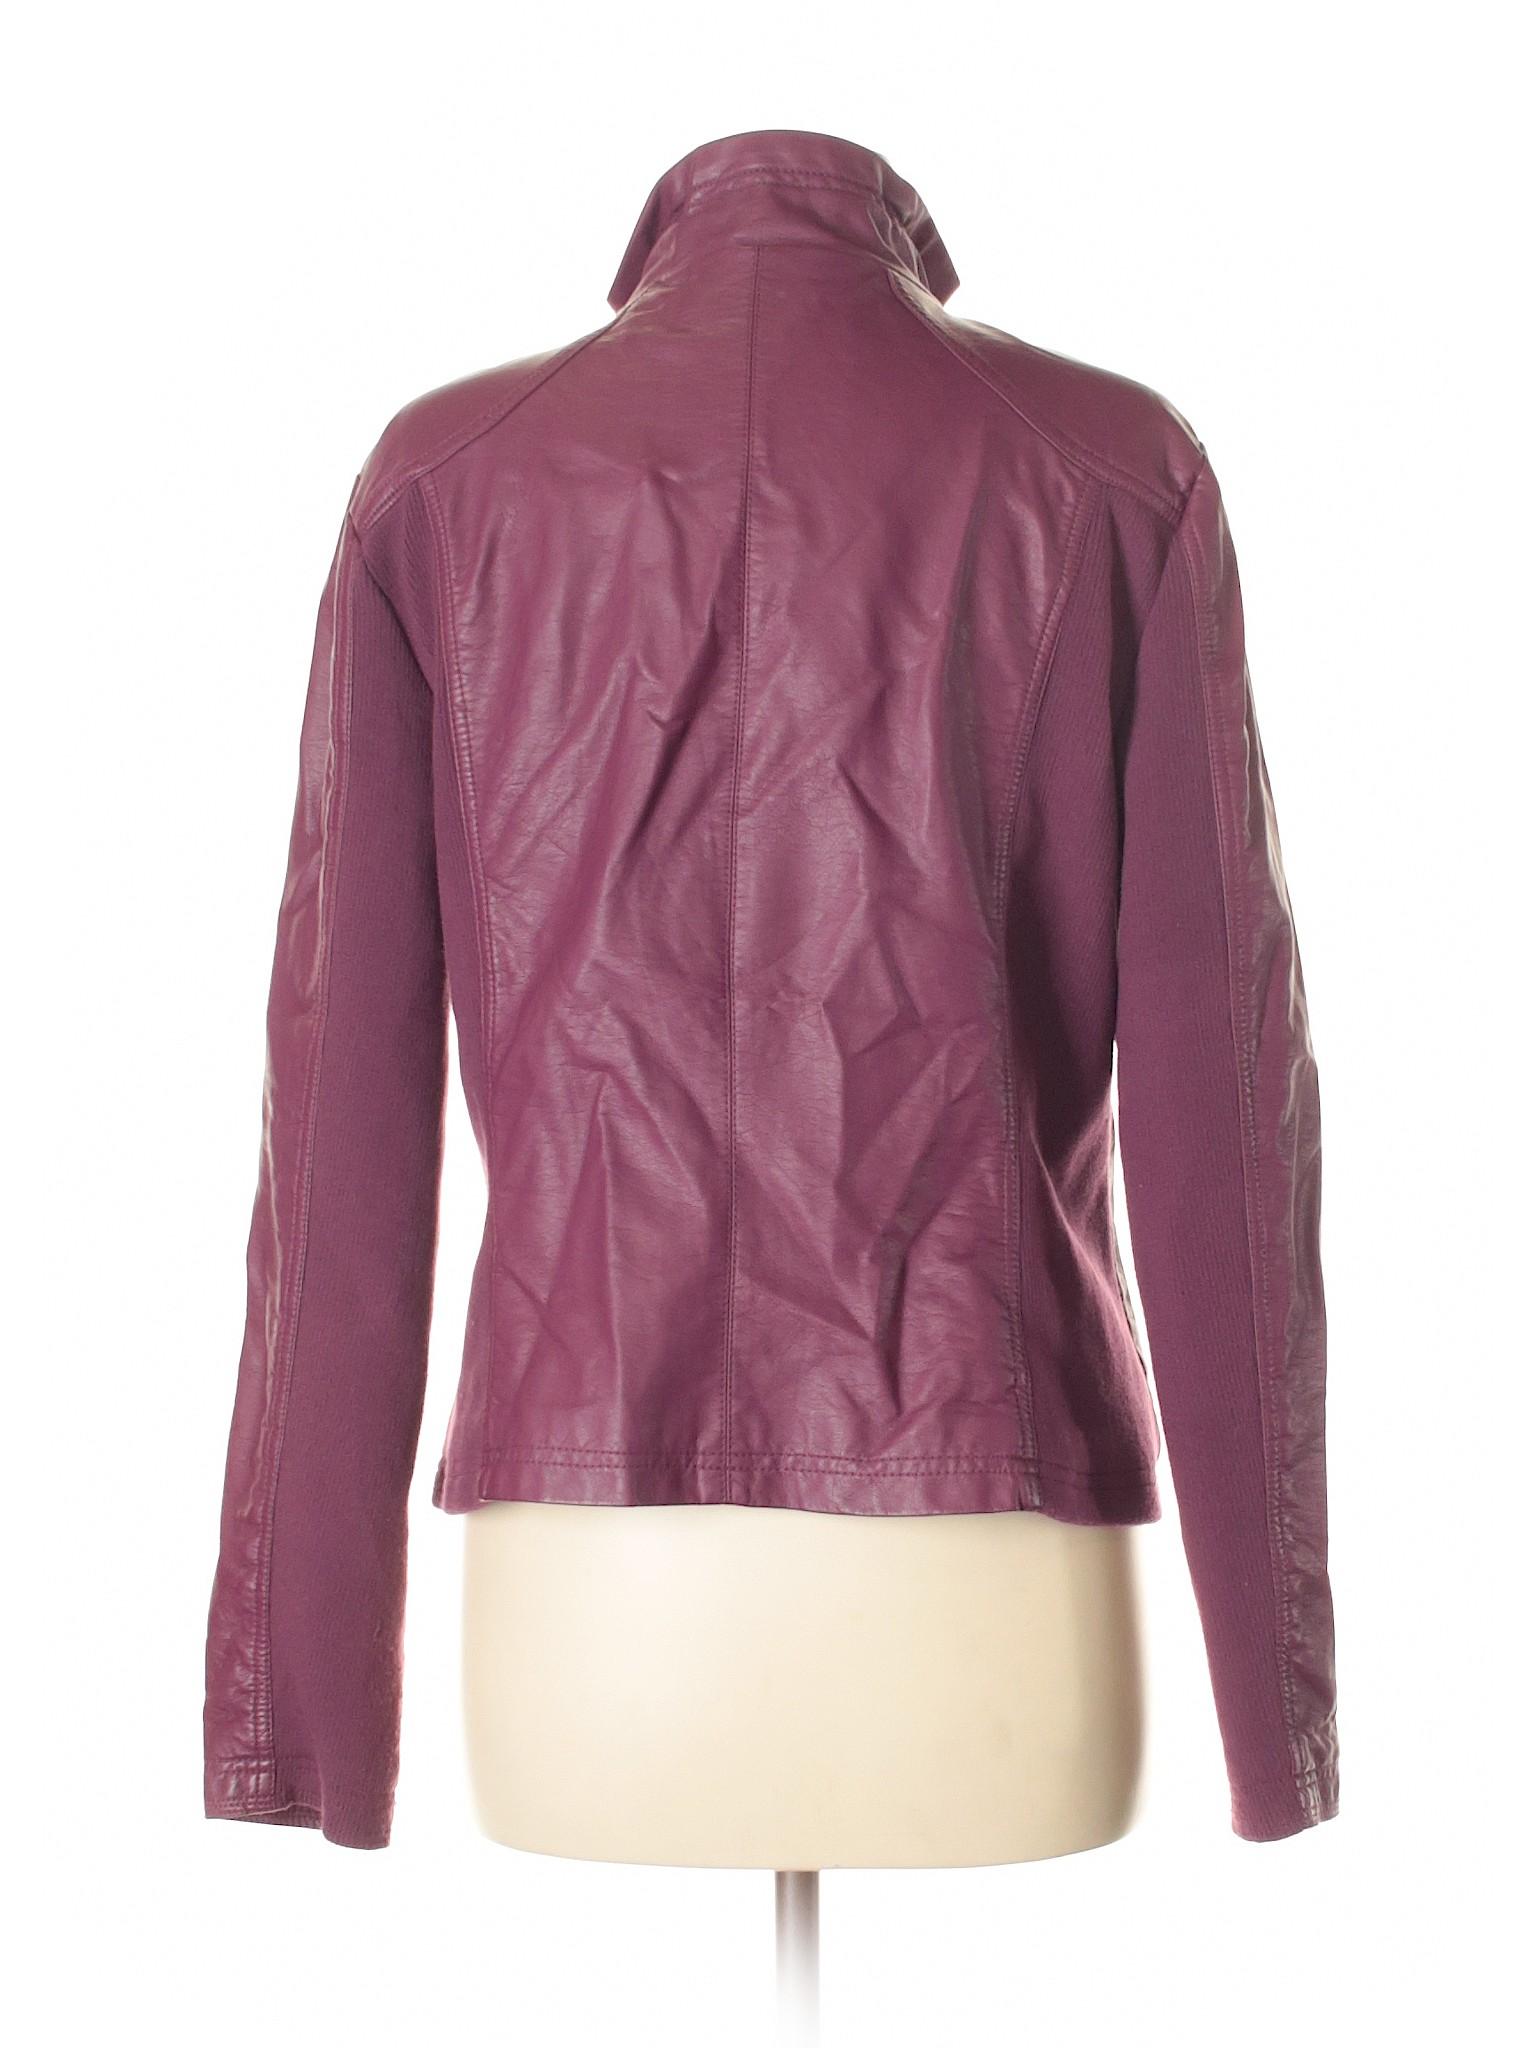 Boutique Leather Faux 5 Jacket winter 48 USfAq